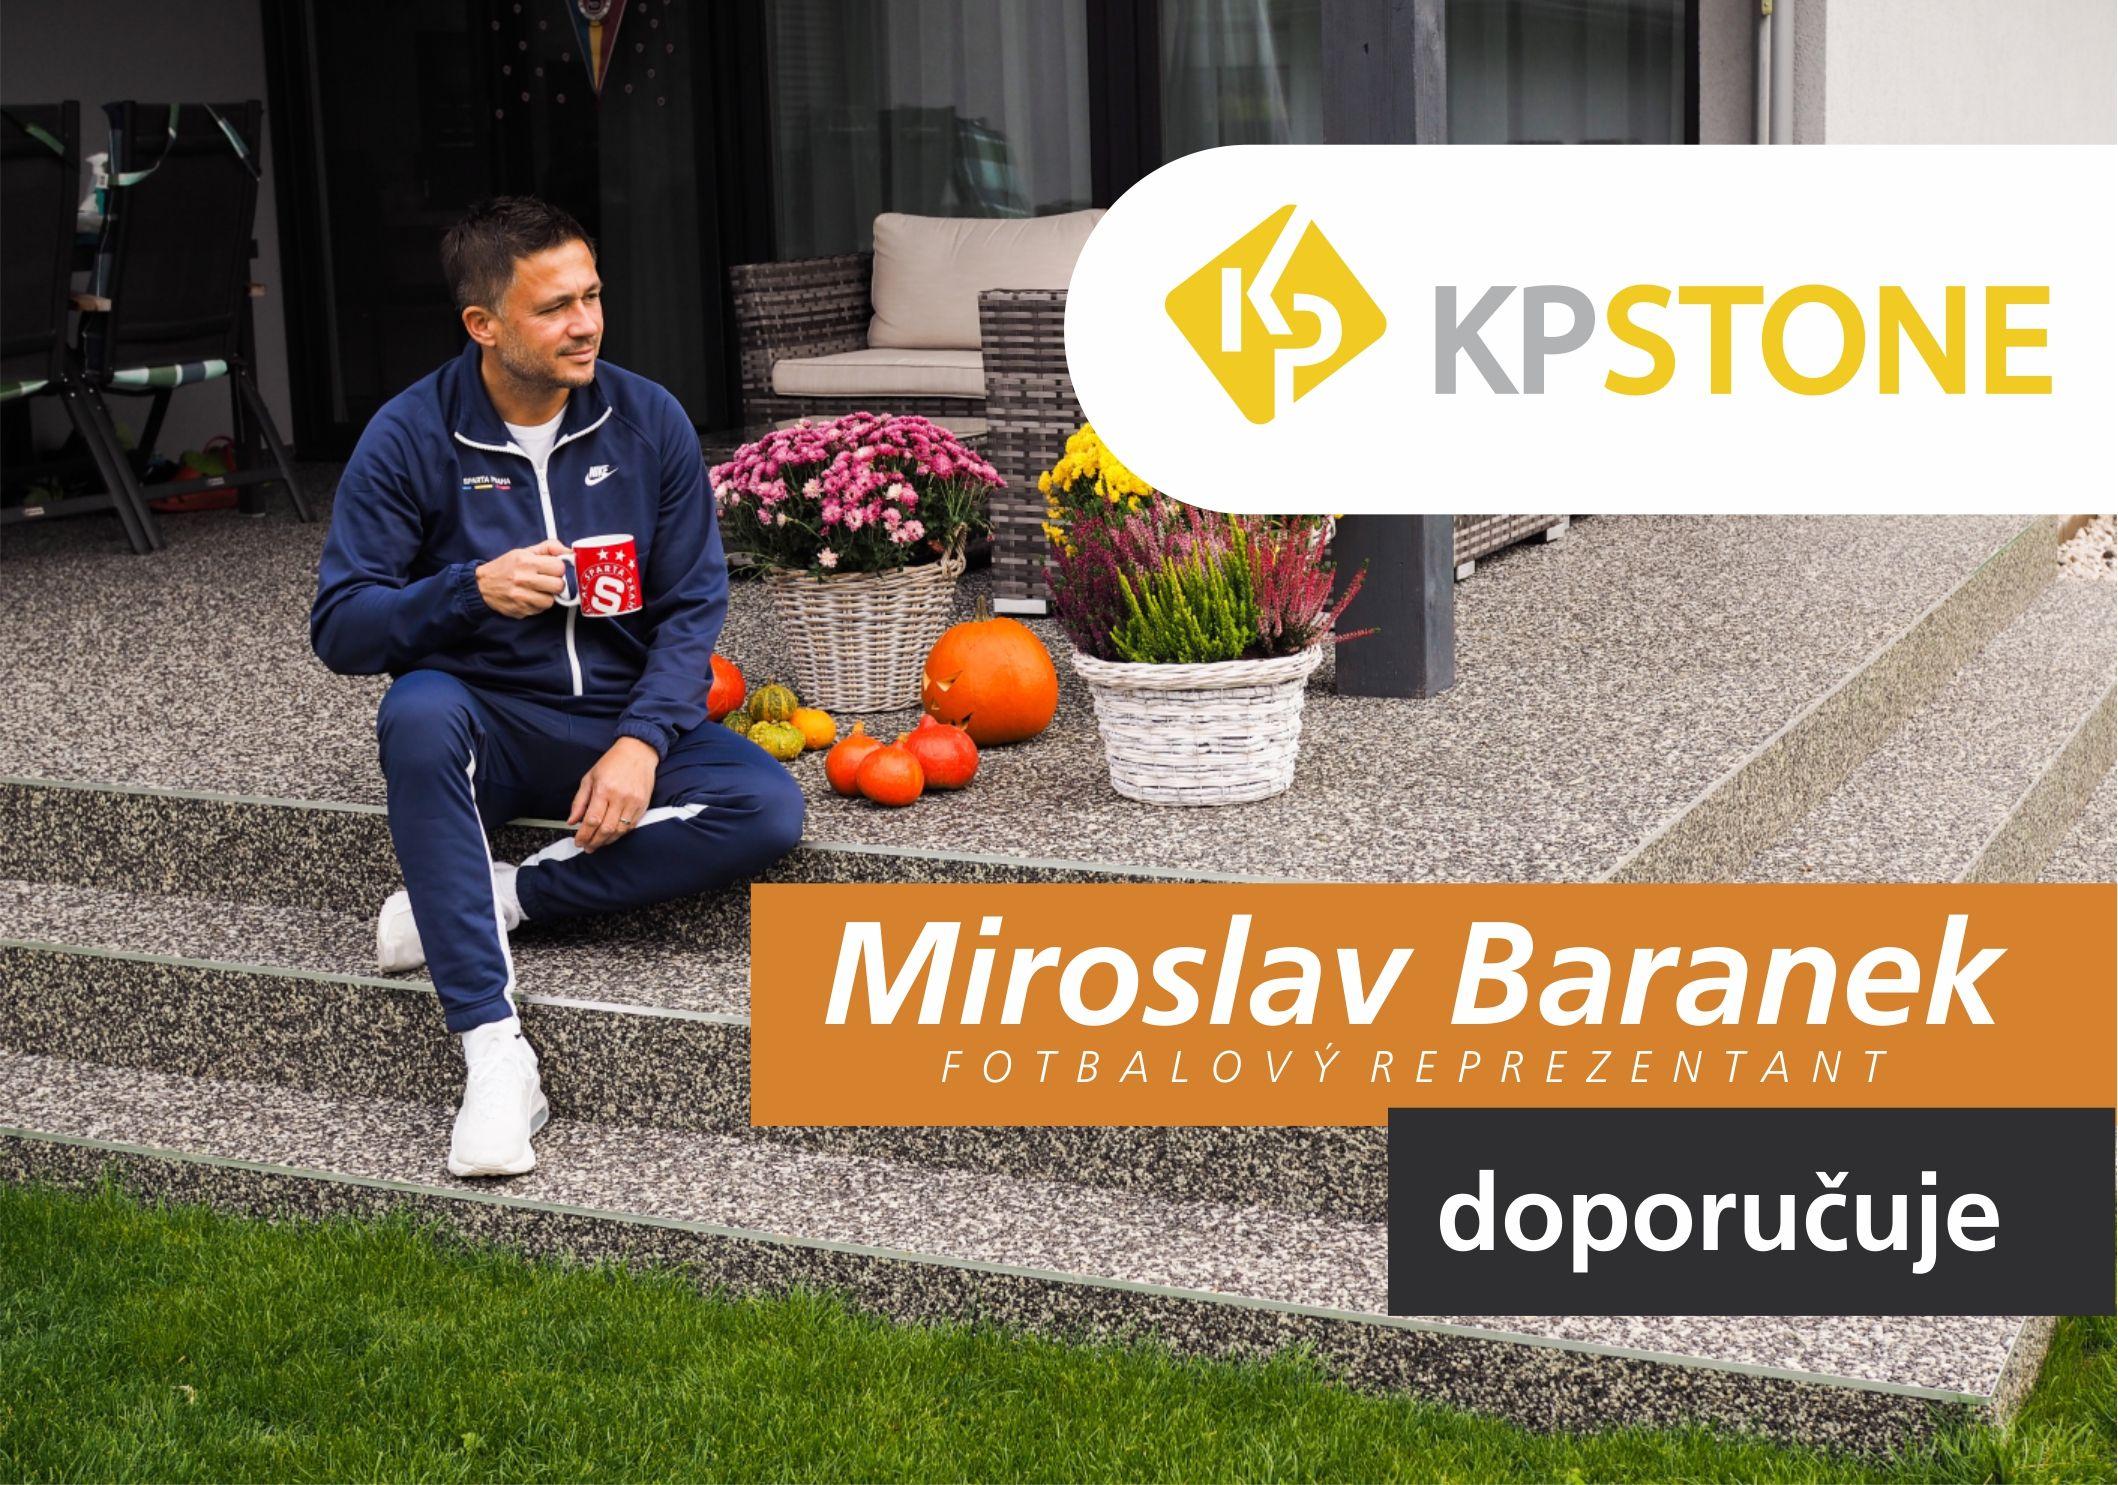 Miroslav Baranek doporučuje KP STONE